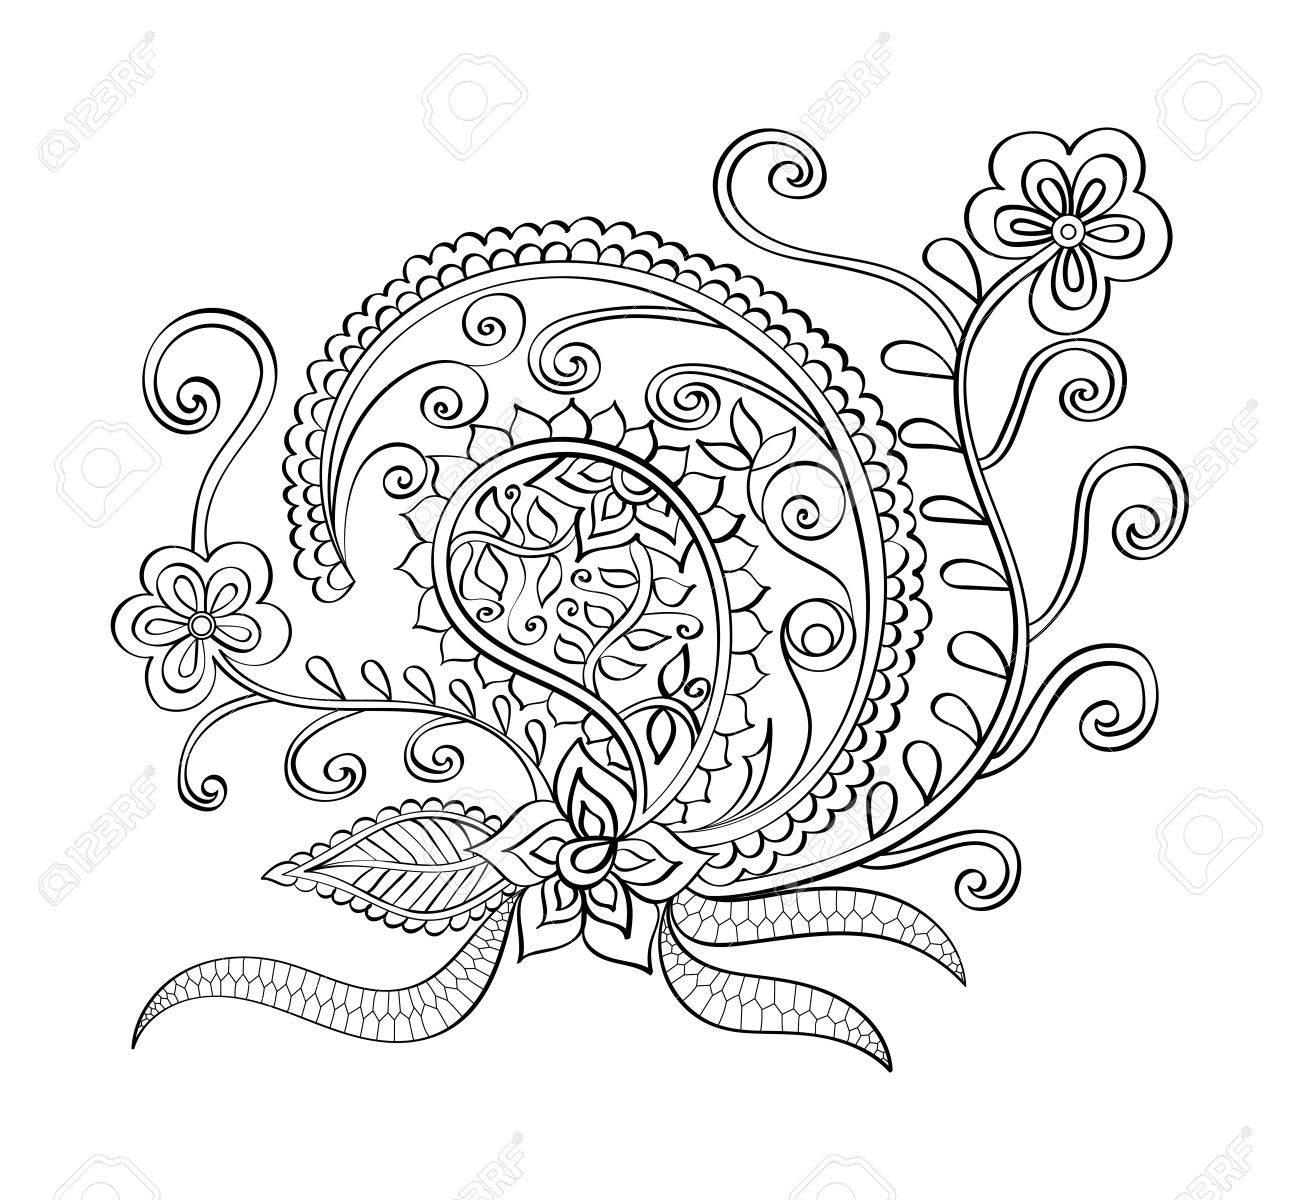 Mandala Dibujado A Mano Del Vector, Mandala De La Página Del Libro ...